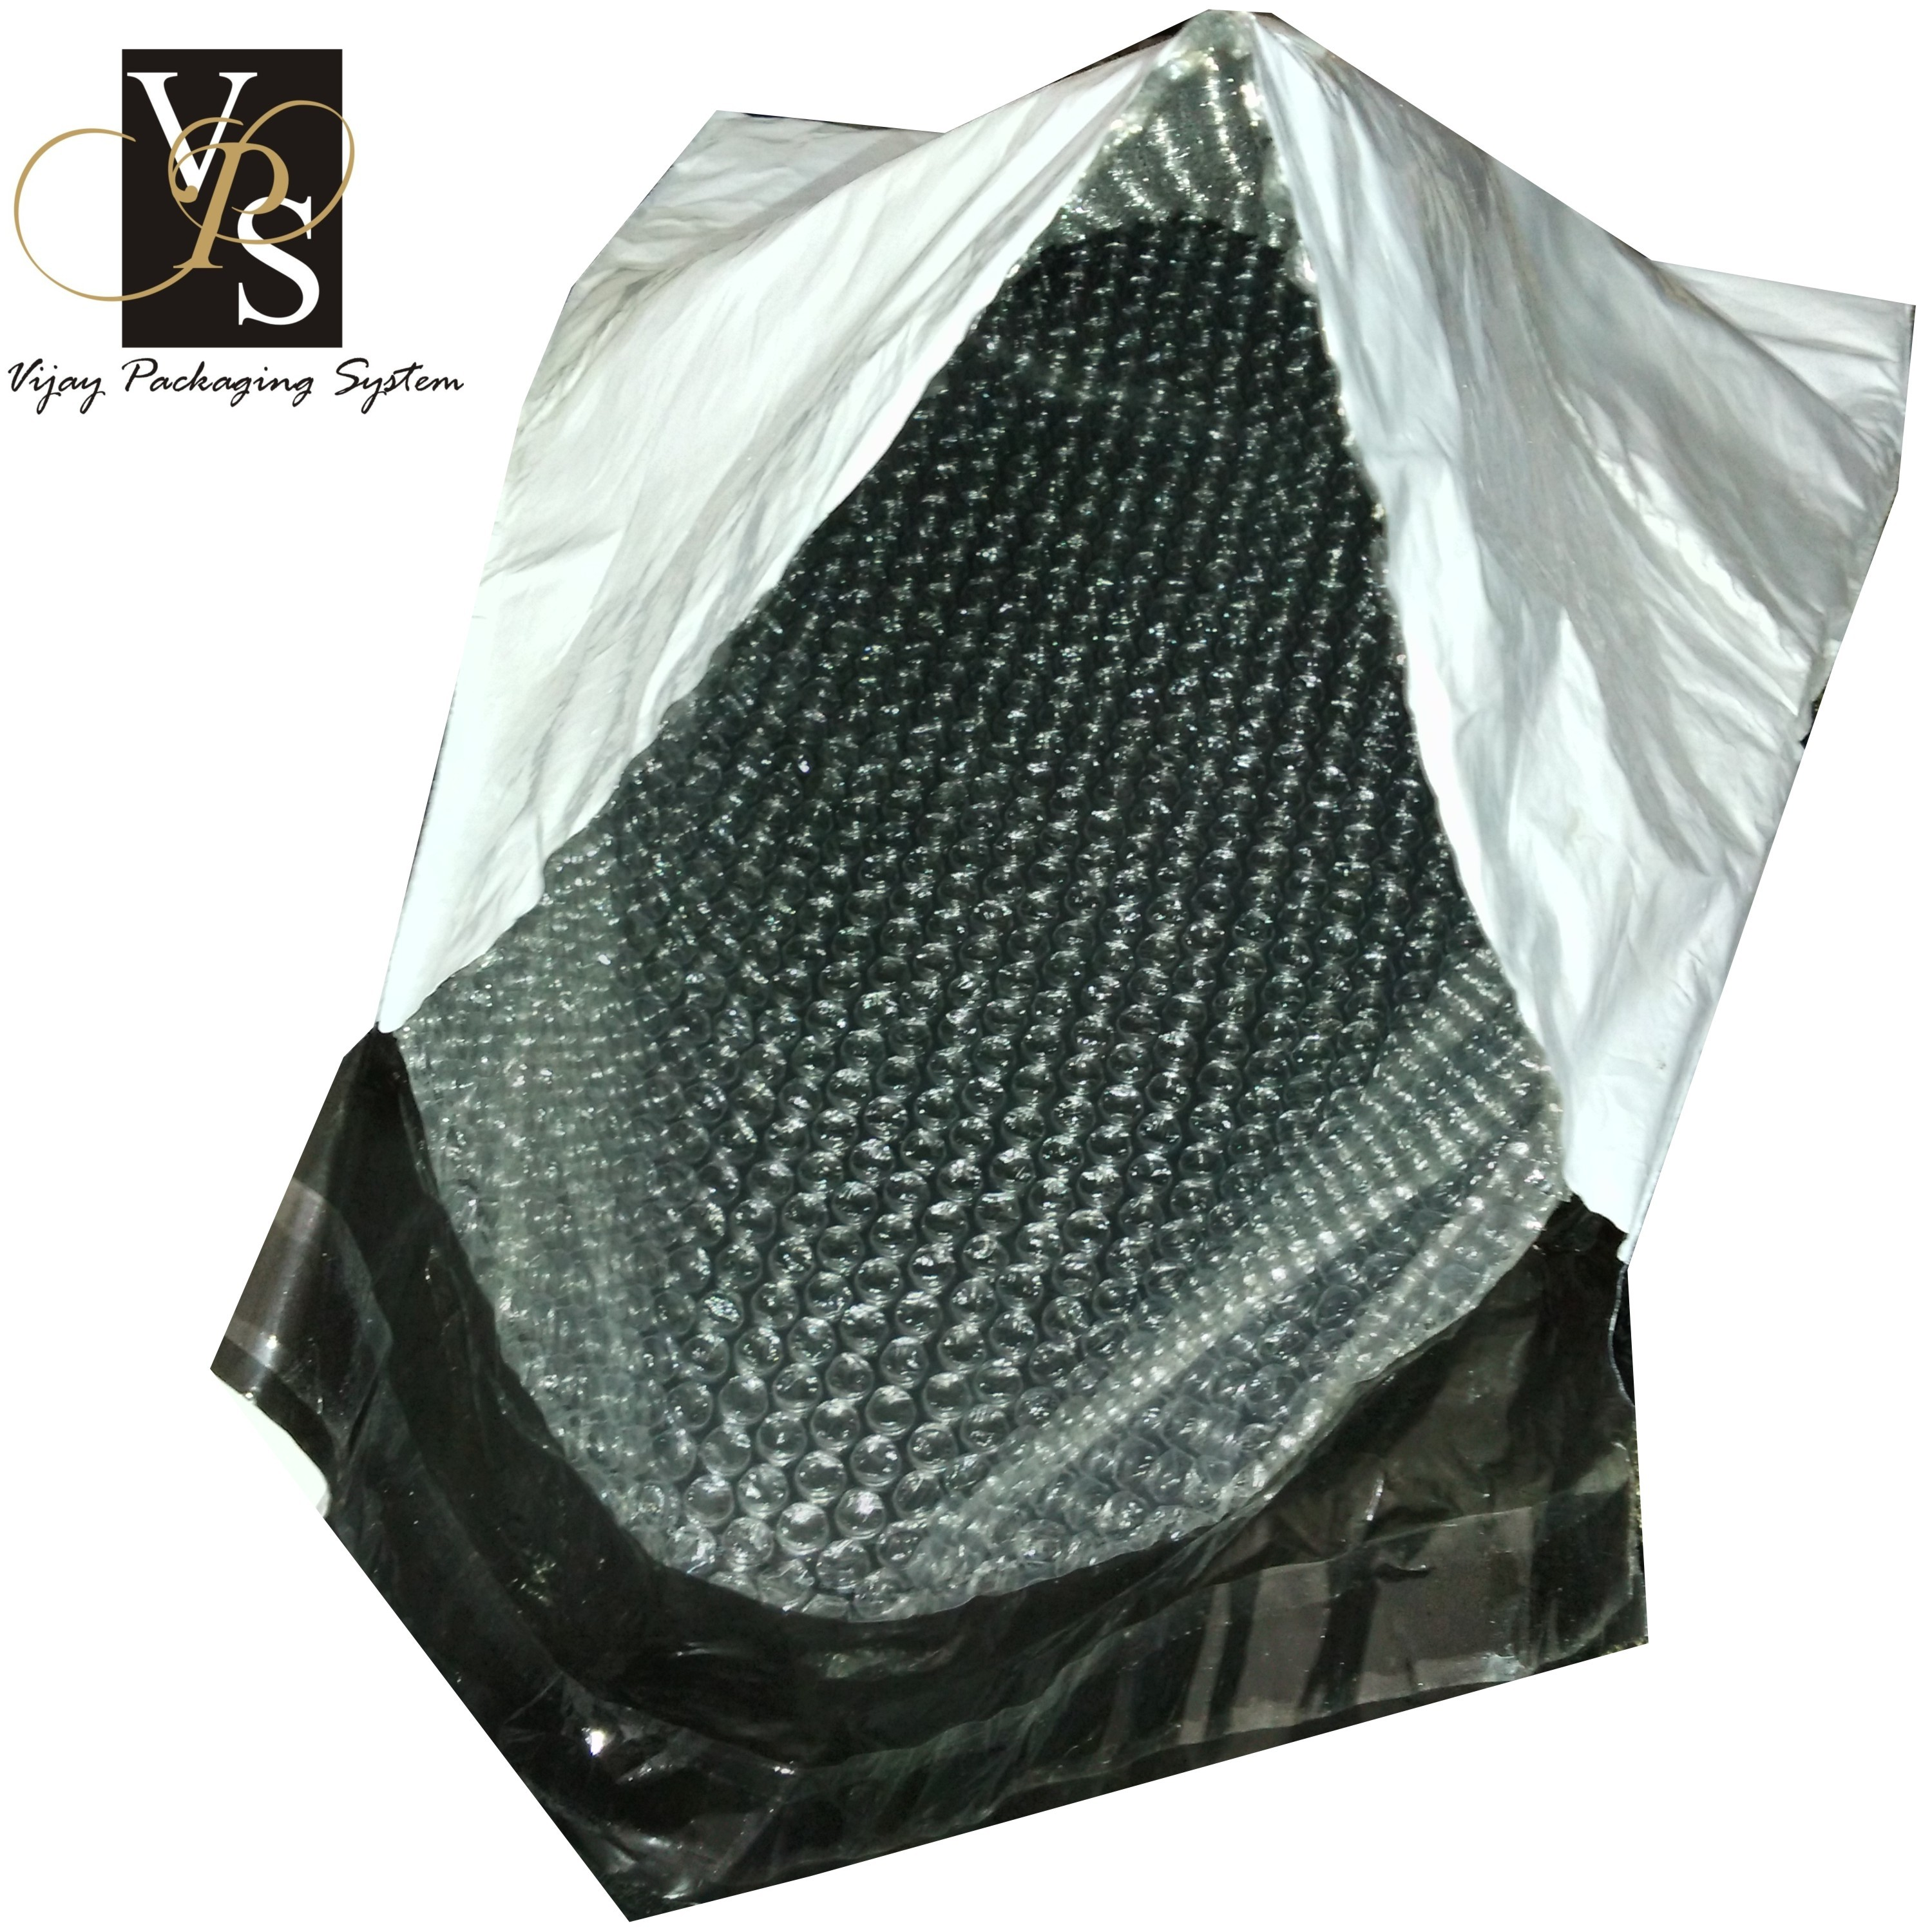 441eb9ade2e Temper Proof Courier Bag with Air Bubble for E-commerce, सेल्फ ...